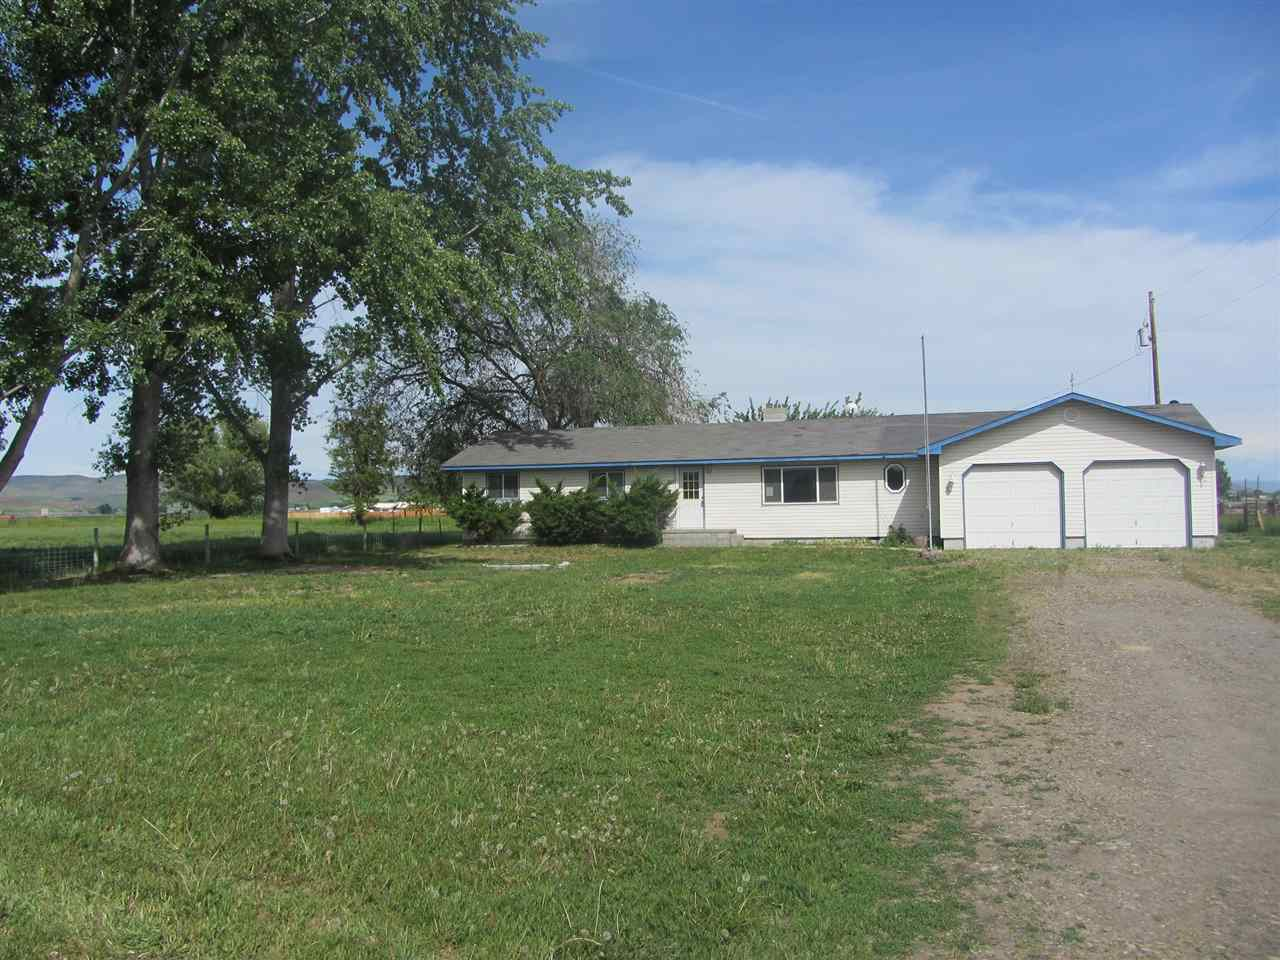 794 Pringle Rd, Weiser, ID 83672